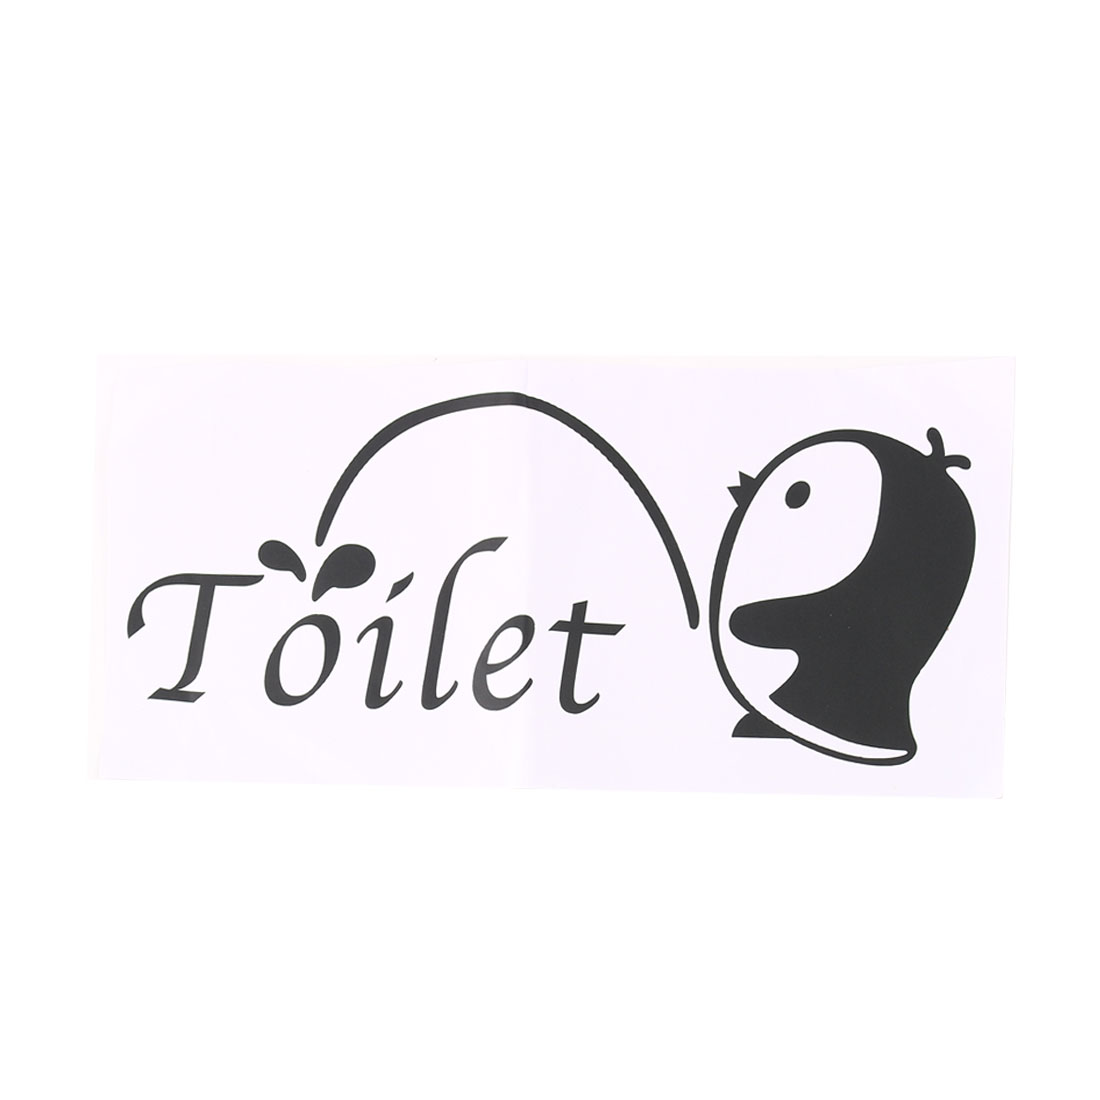 Cartoon Penguin Wall Sticker Paper Decals Bathroom Washroom Apartment Decoration